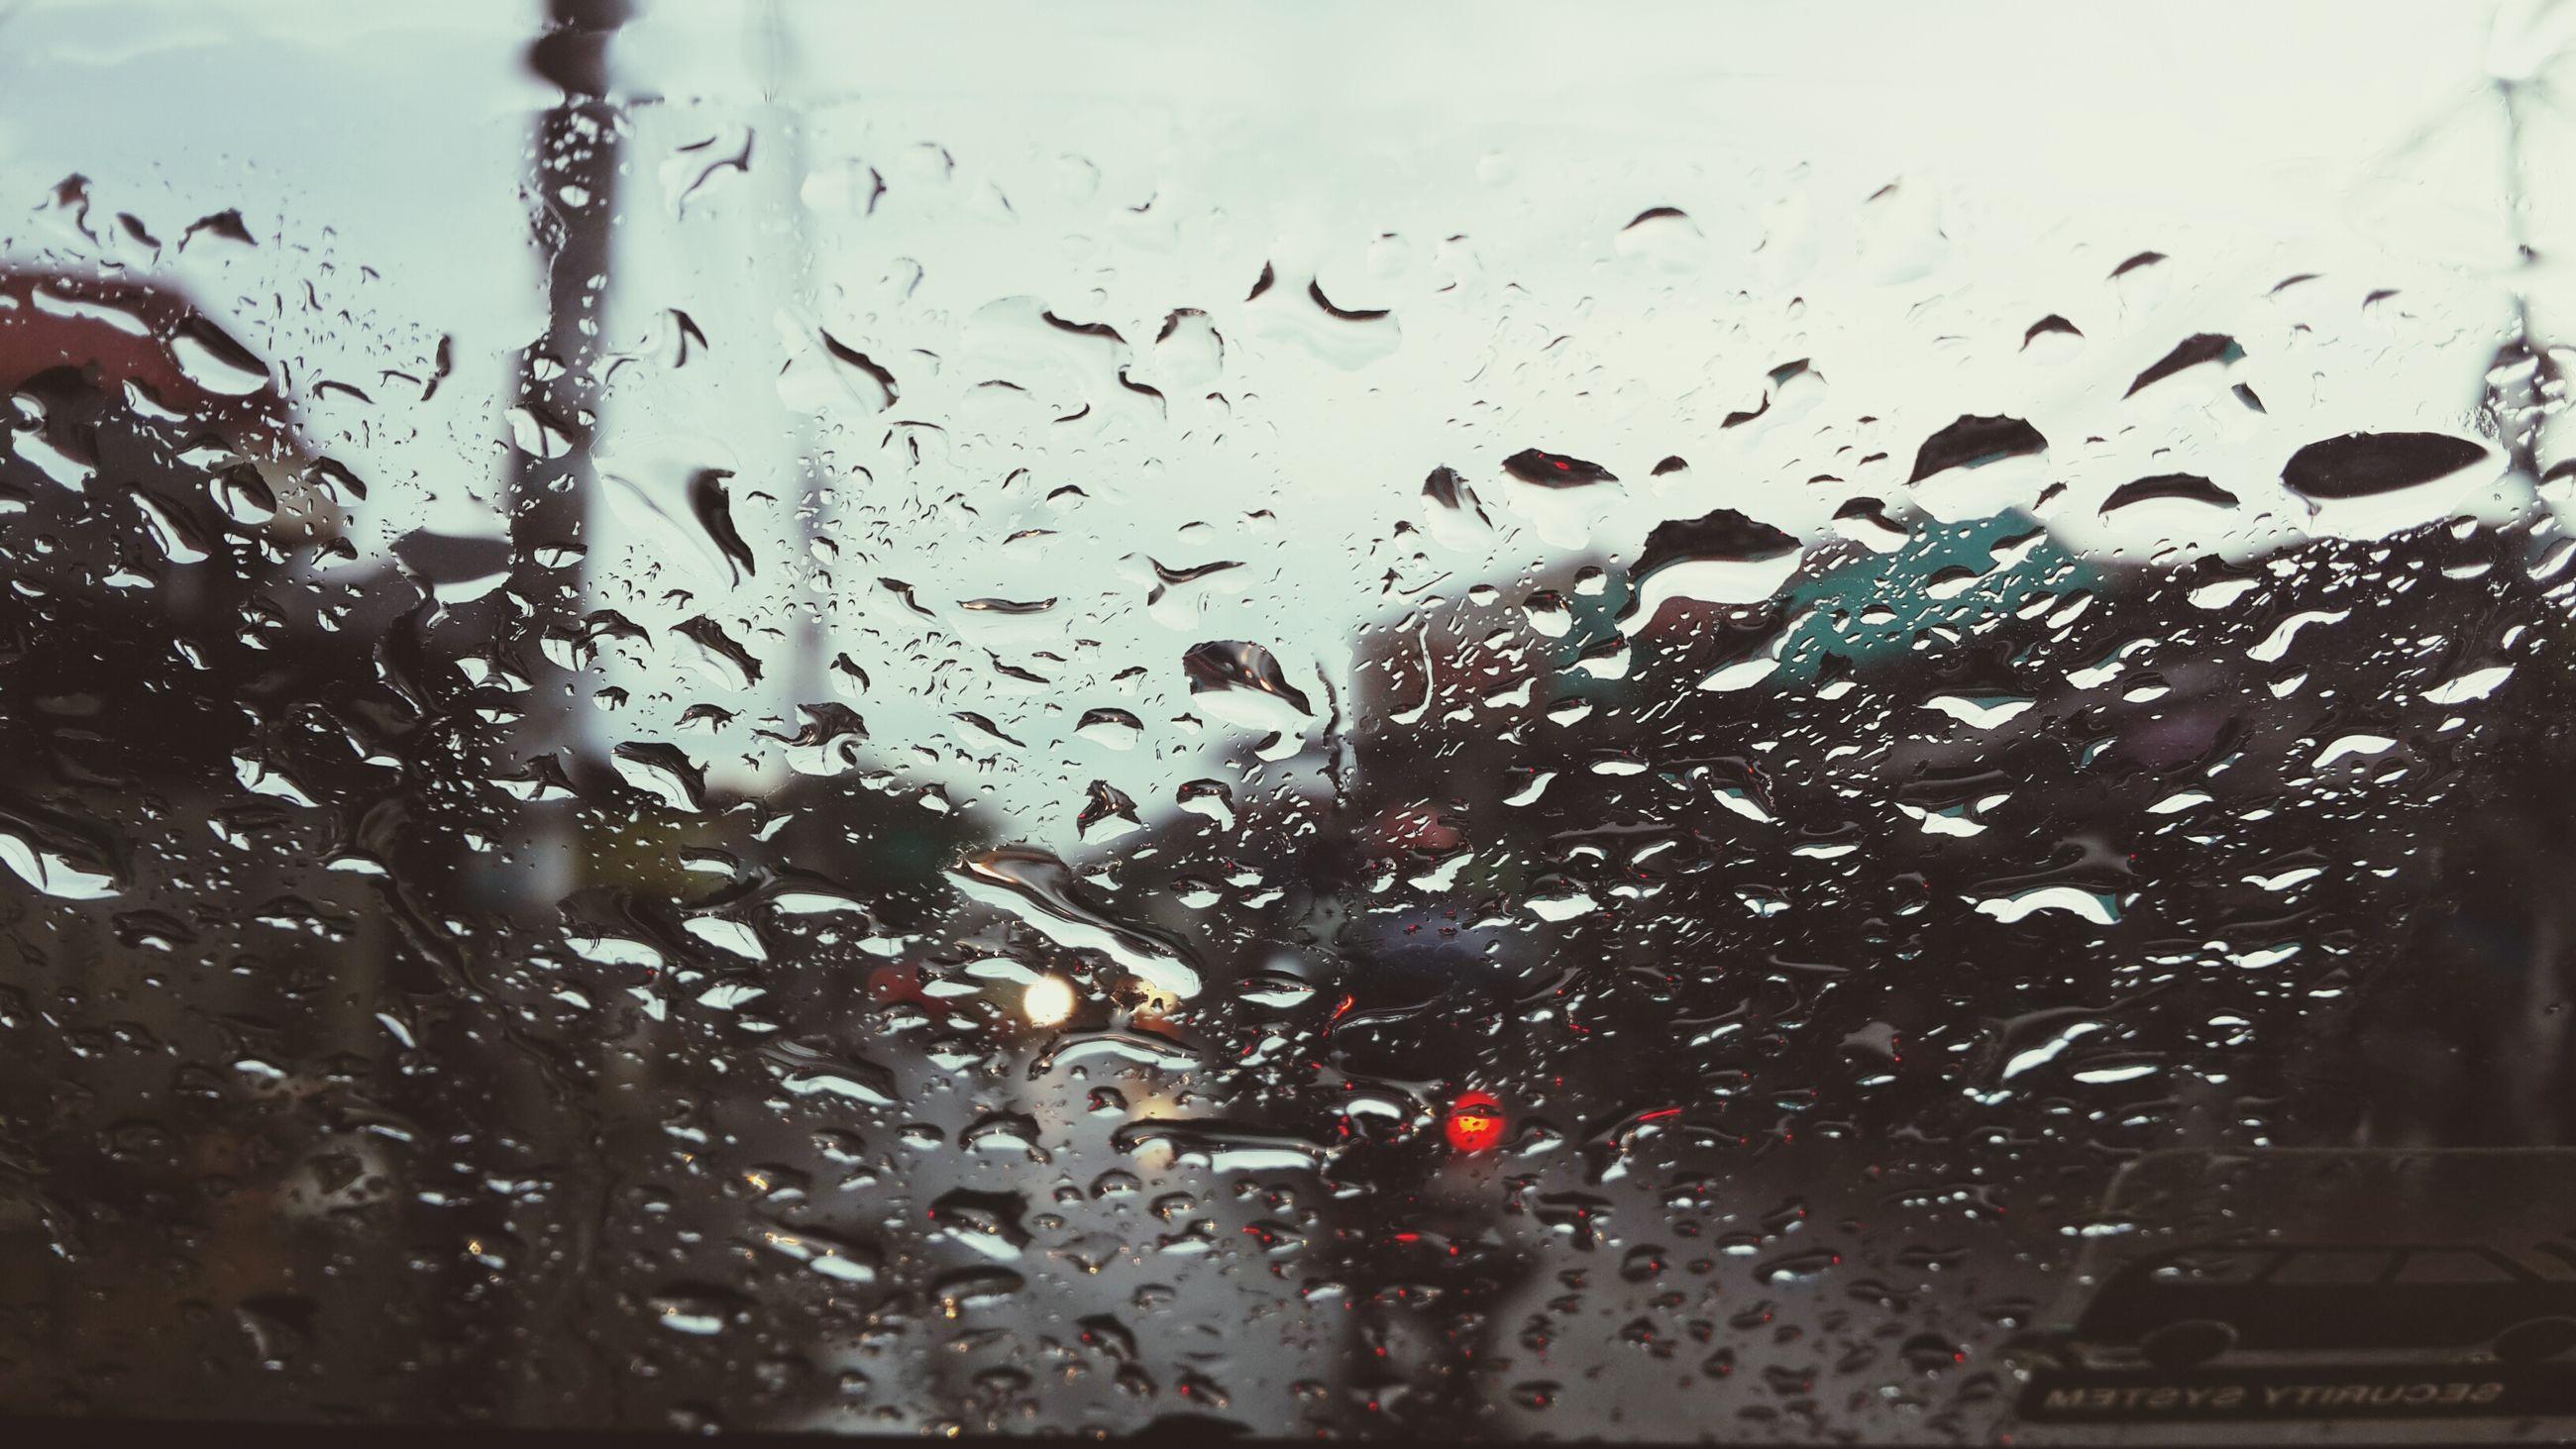 drop, window, wet, transparent, indoors, glass - material, rain, water, weather, raindrop, season, car, glass, transportation, sky, vehicle interior, land vehicle, full frame, built structure, backgrounds